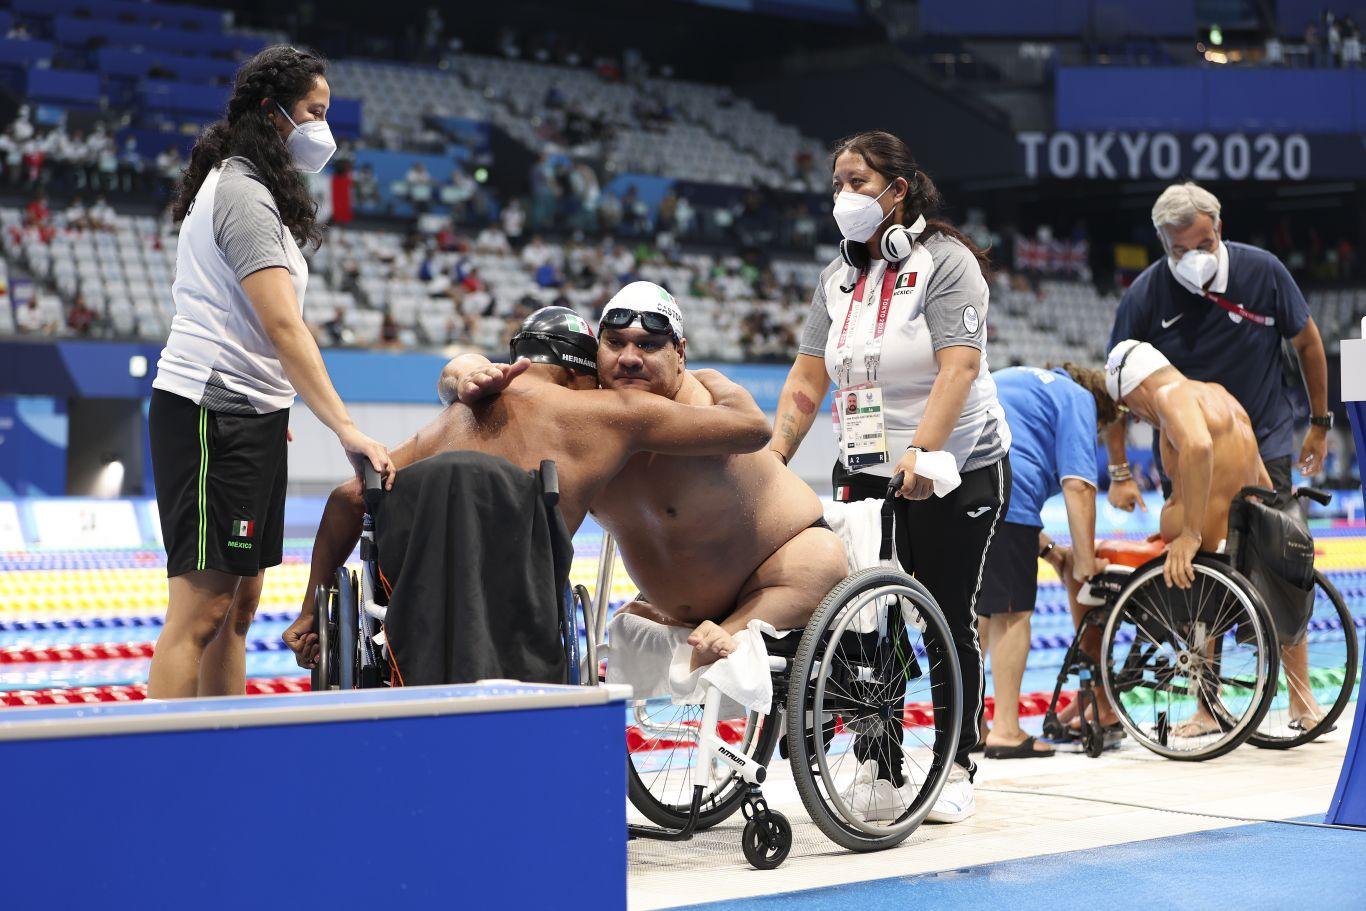 Paralimpíadas capacitismo Tóquio